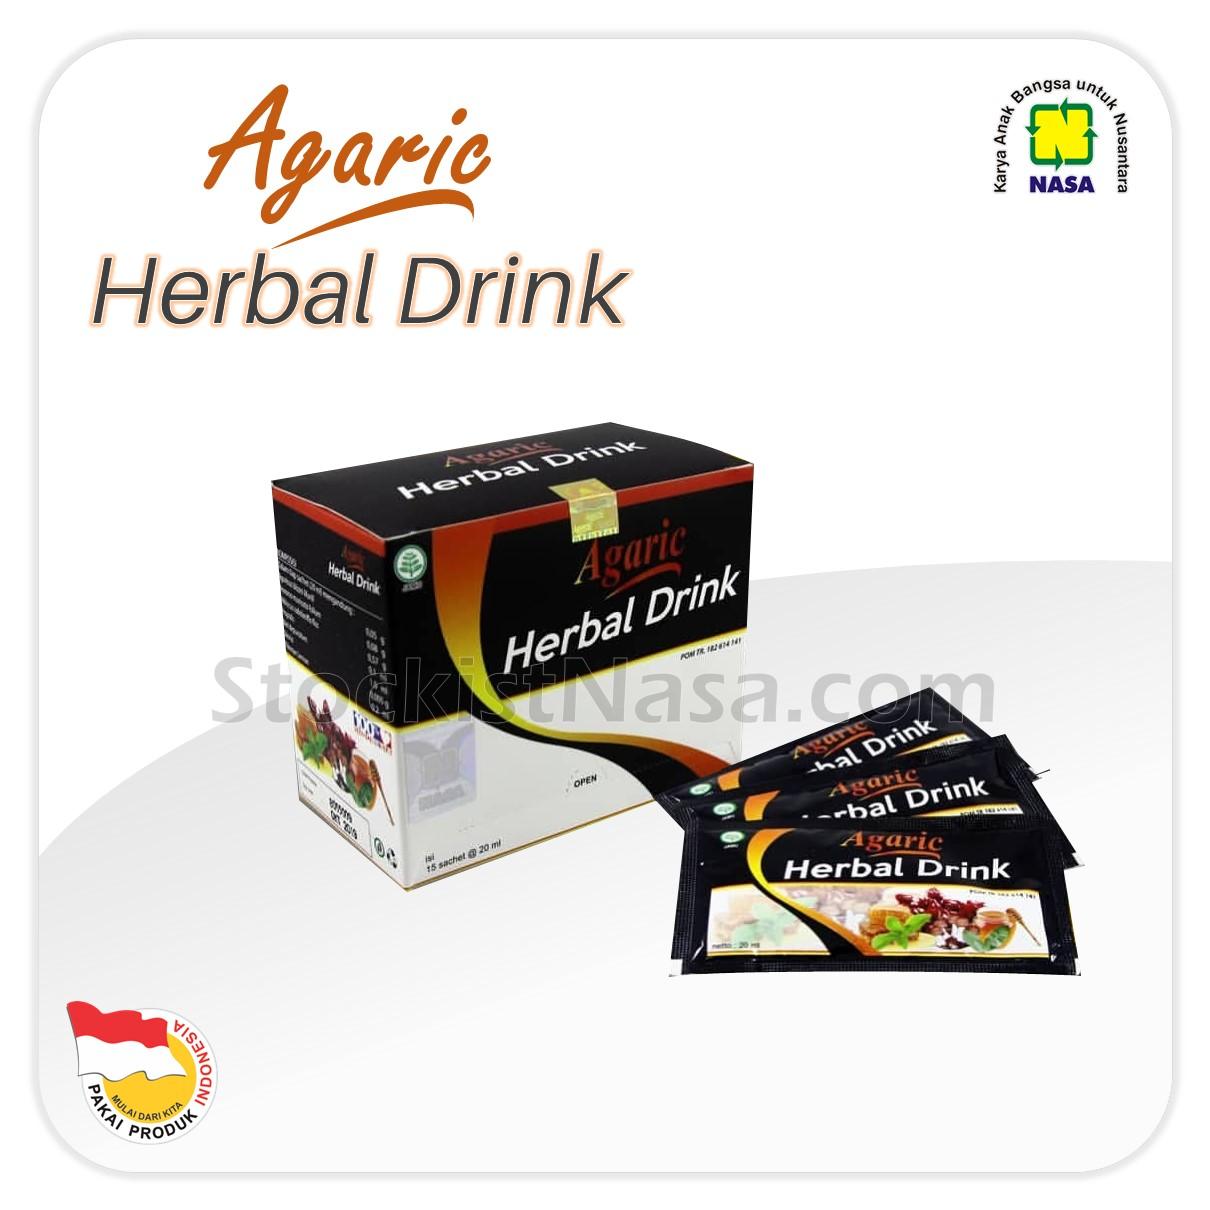 Agaric Herbal Drink Nasa